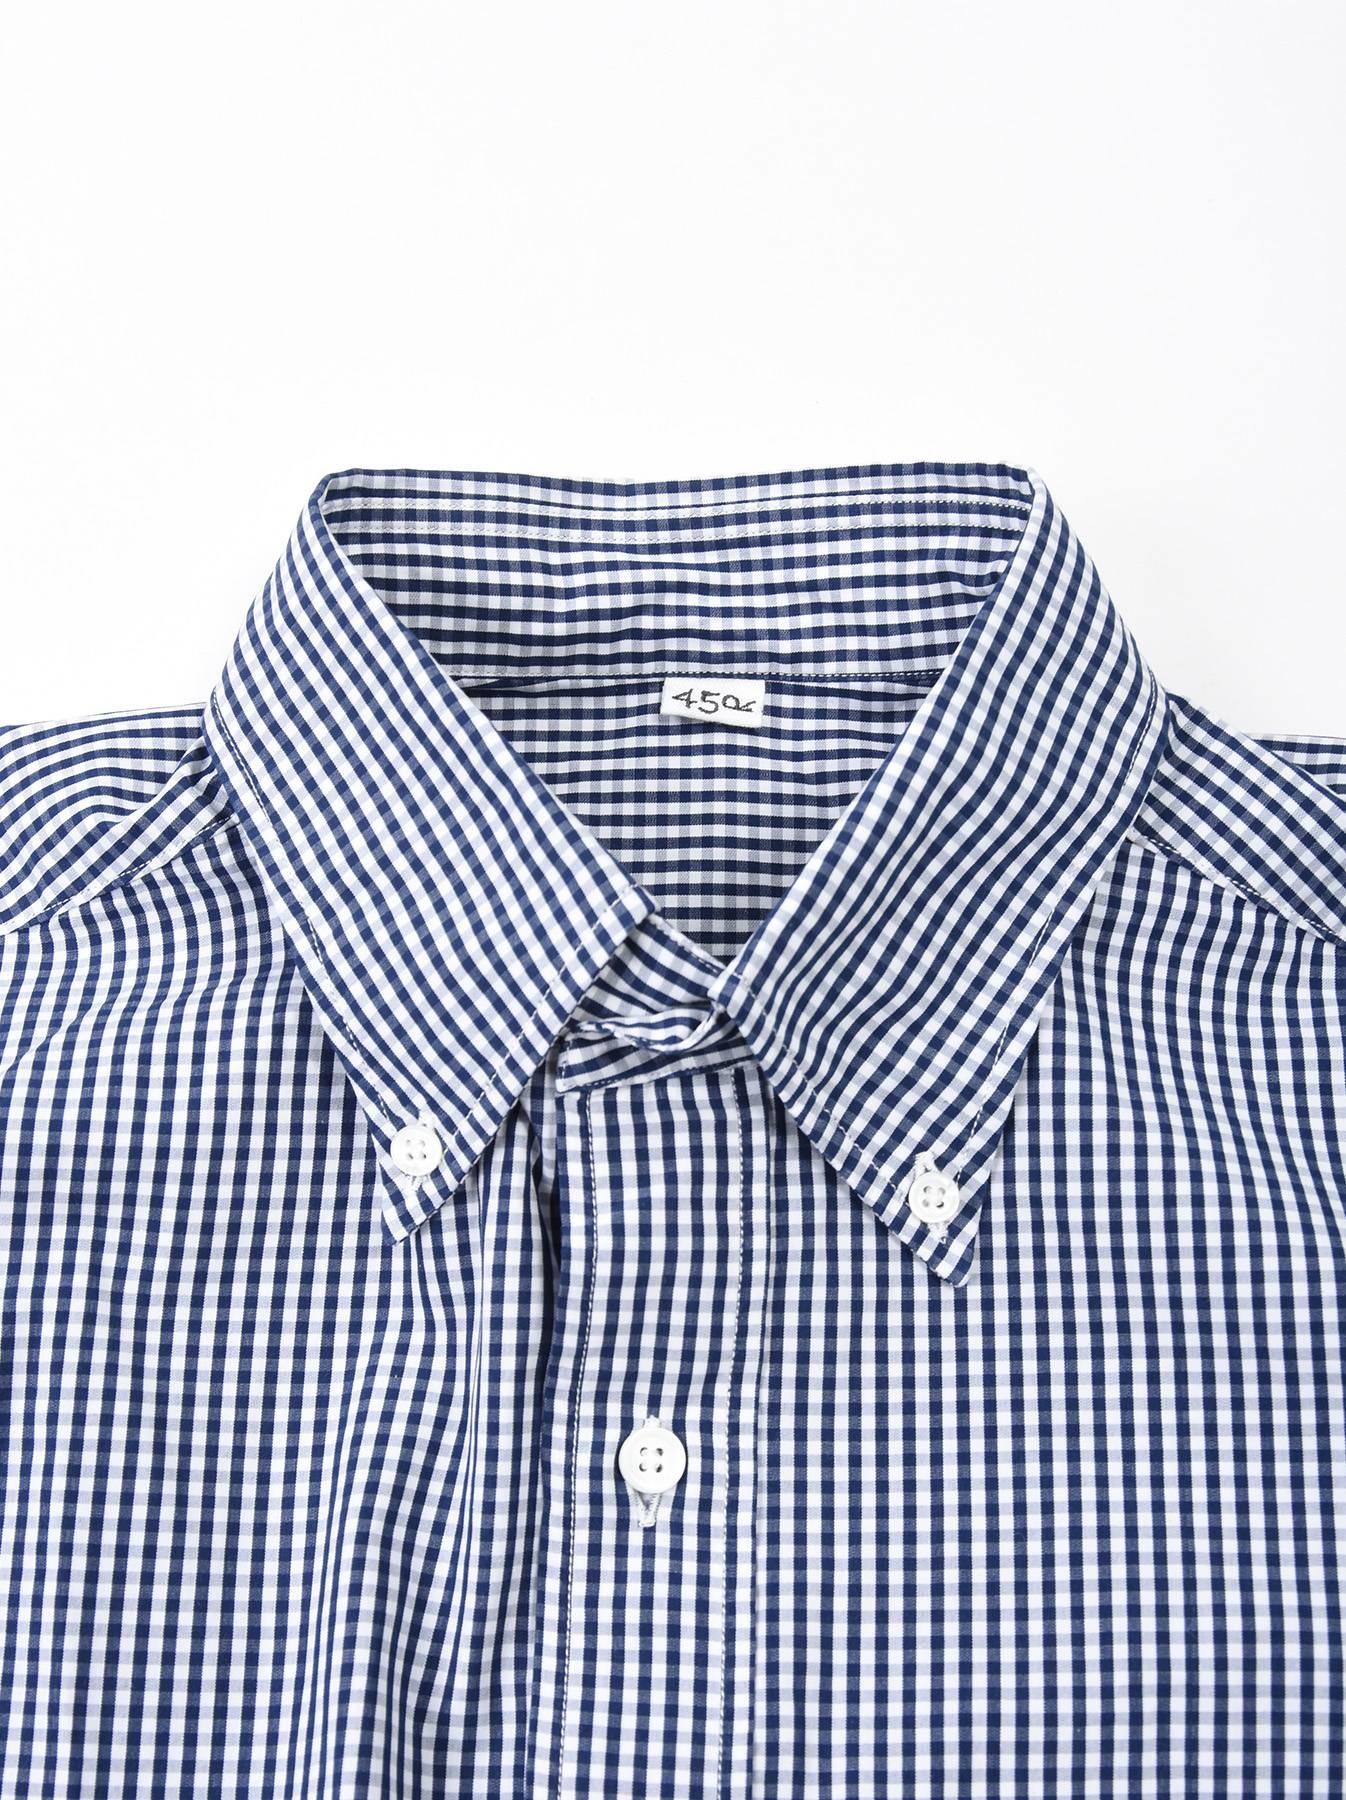 180/3 Suvin Cotton Button Down Shirt-6